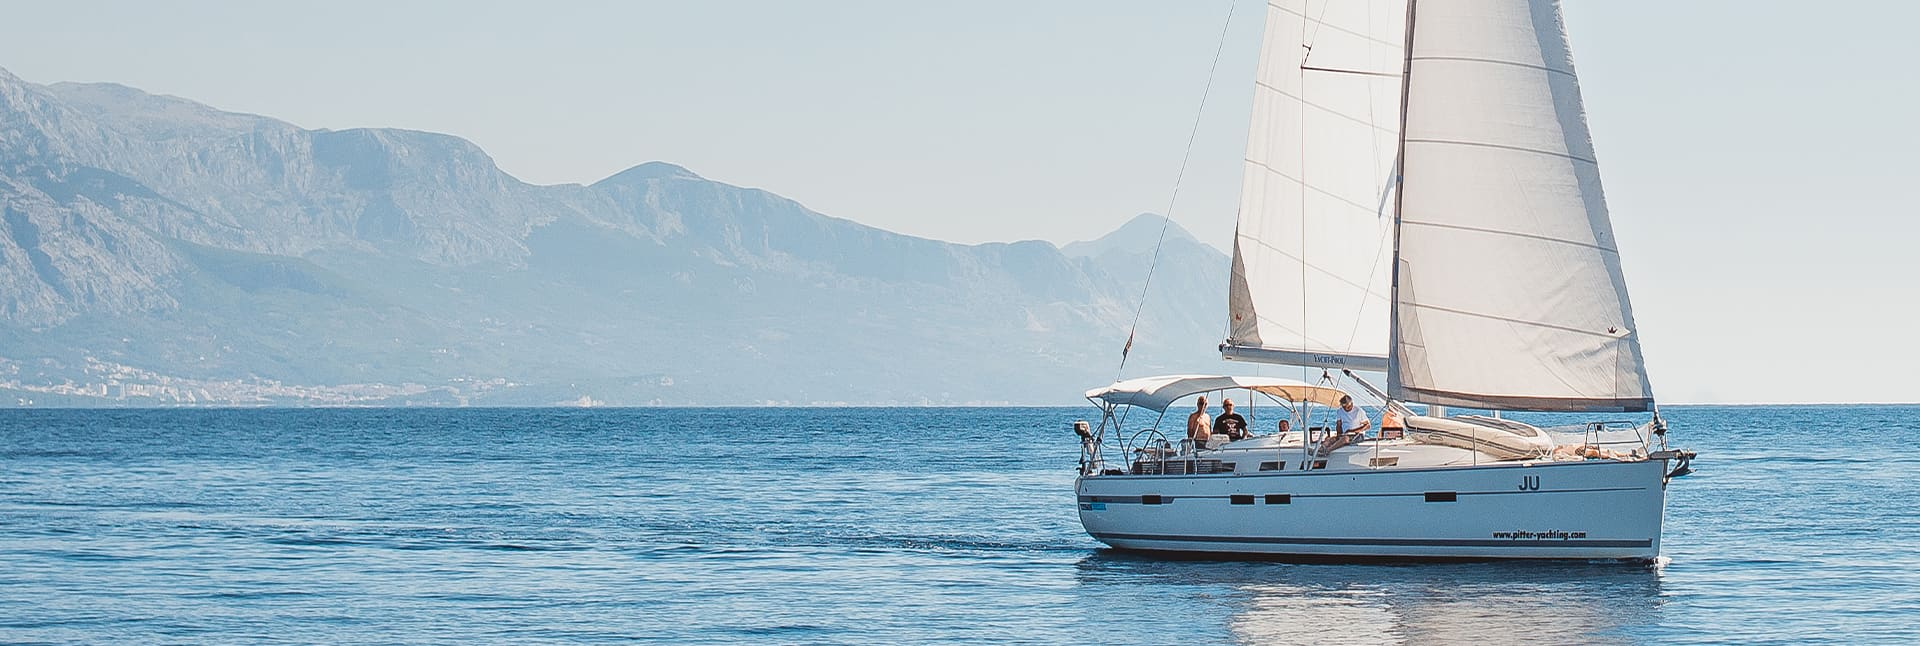 Starco insurance boat insurance header